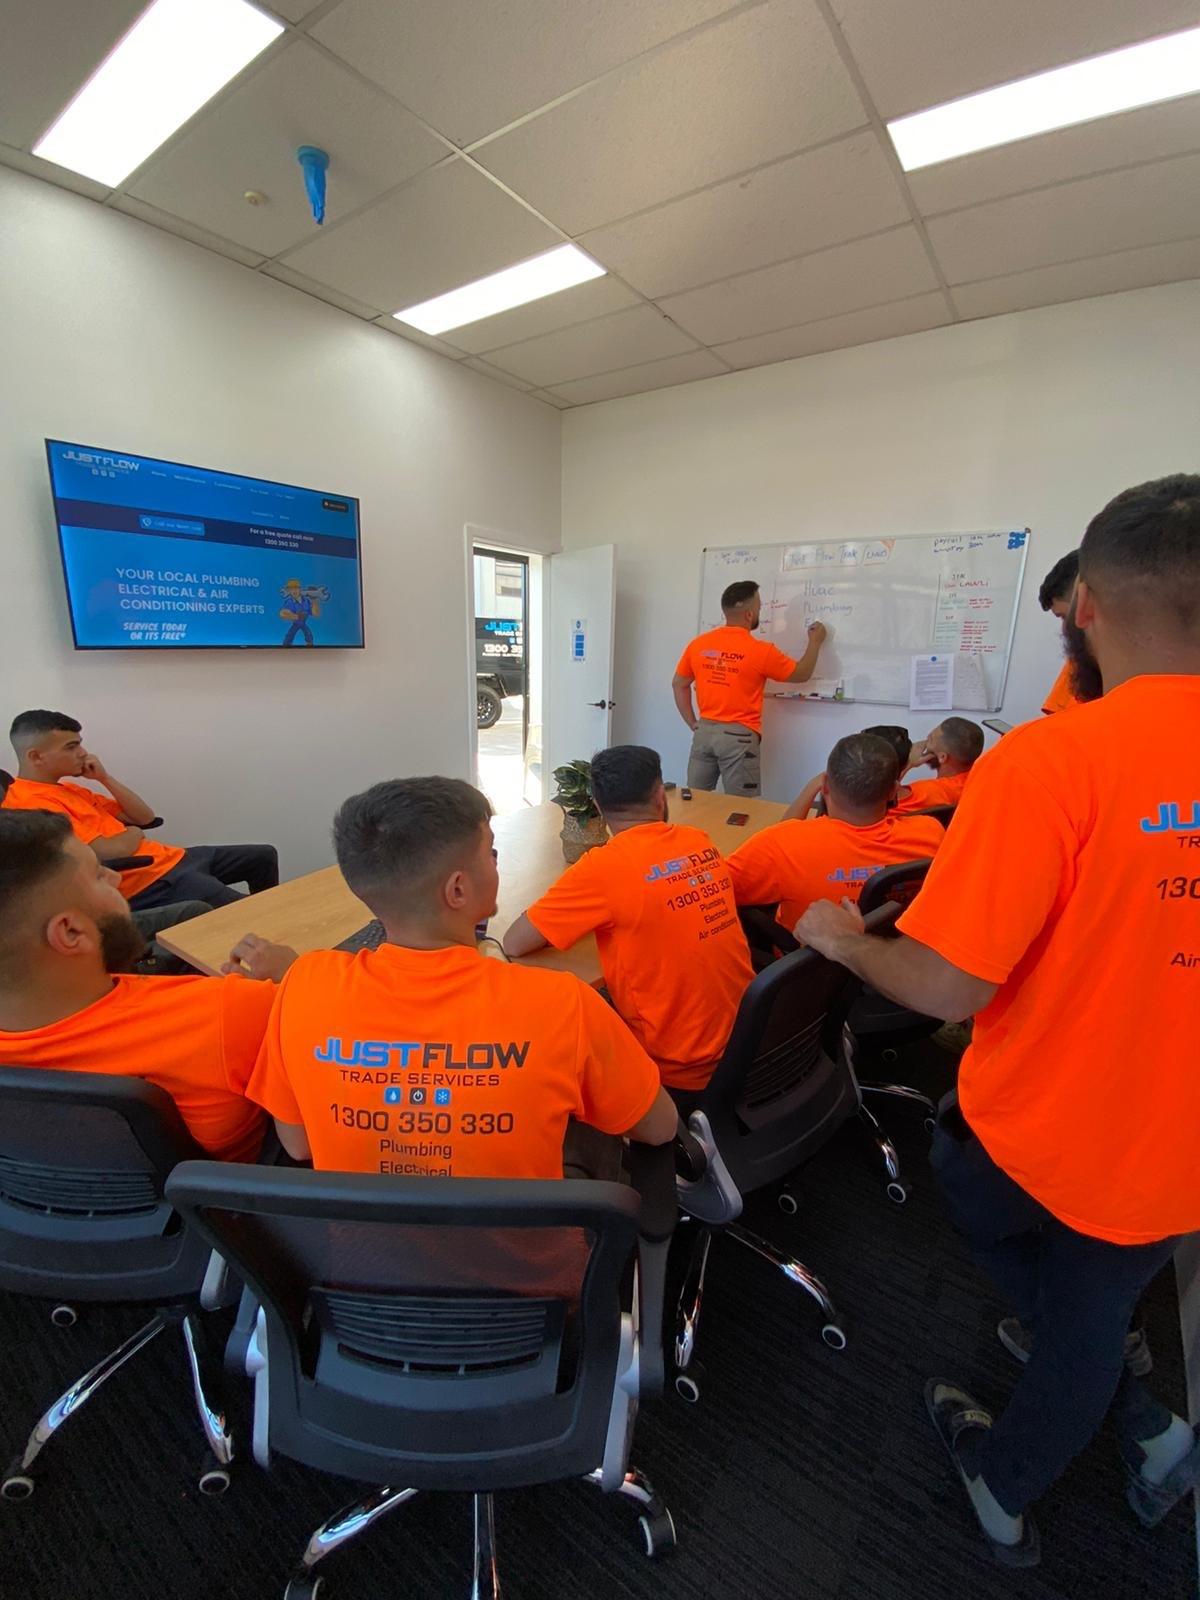 Justflow Plumbing, Electrical & Air Conditioning HVAC Team Moorebank Office Learning